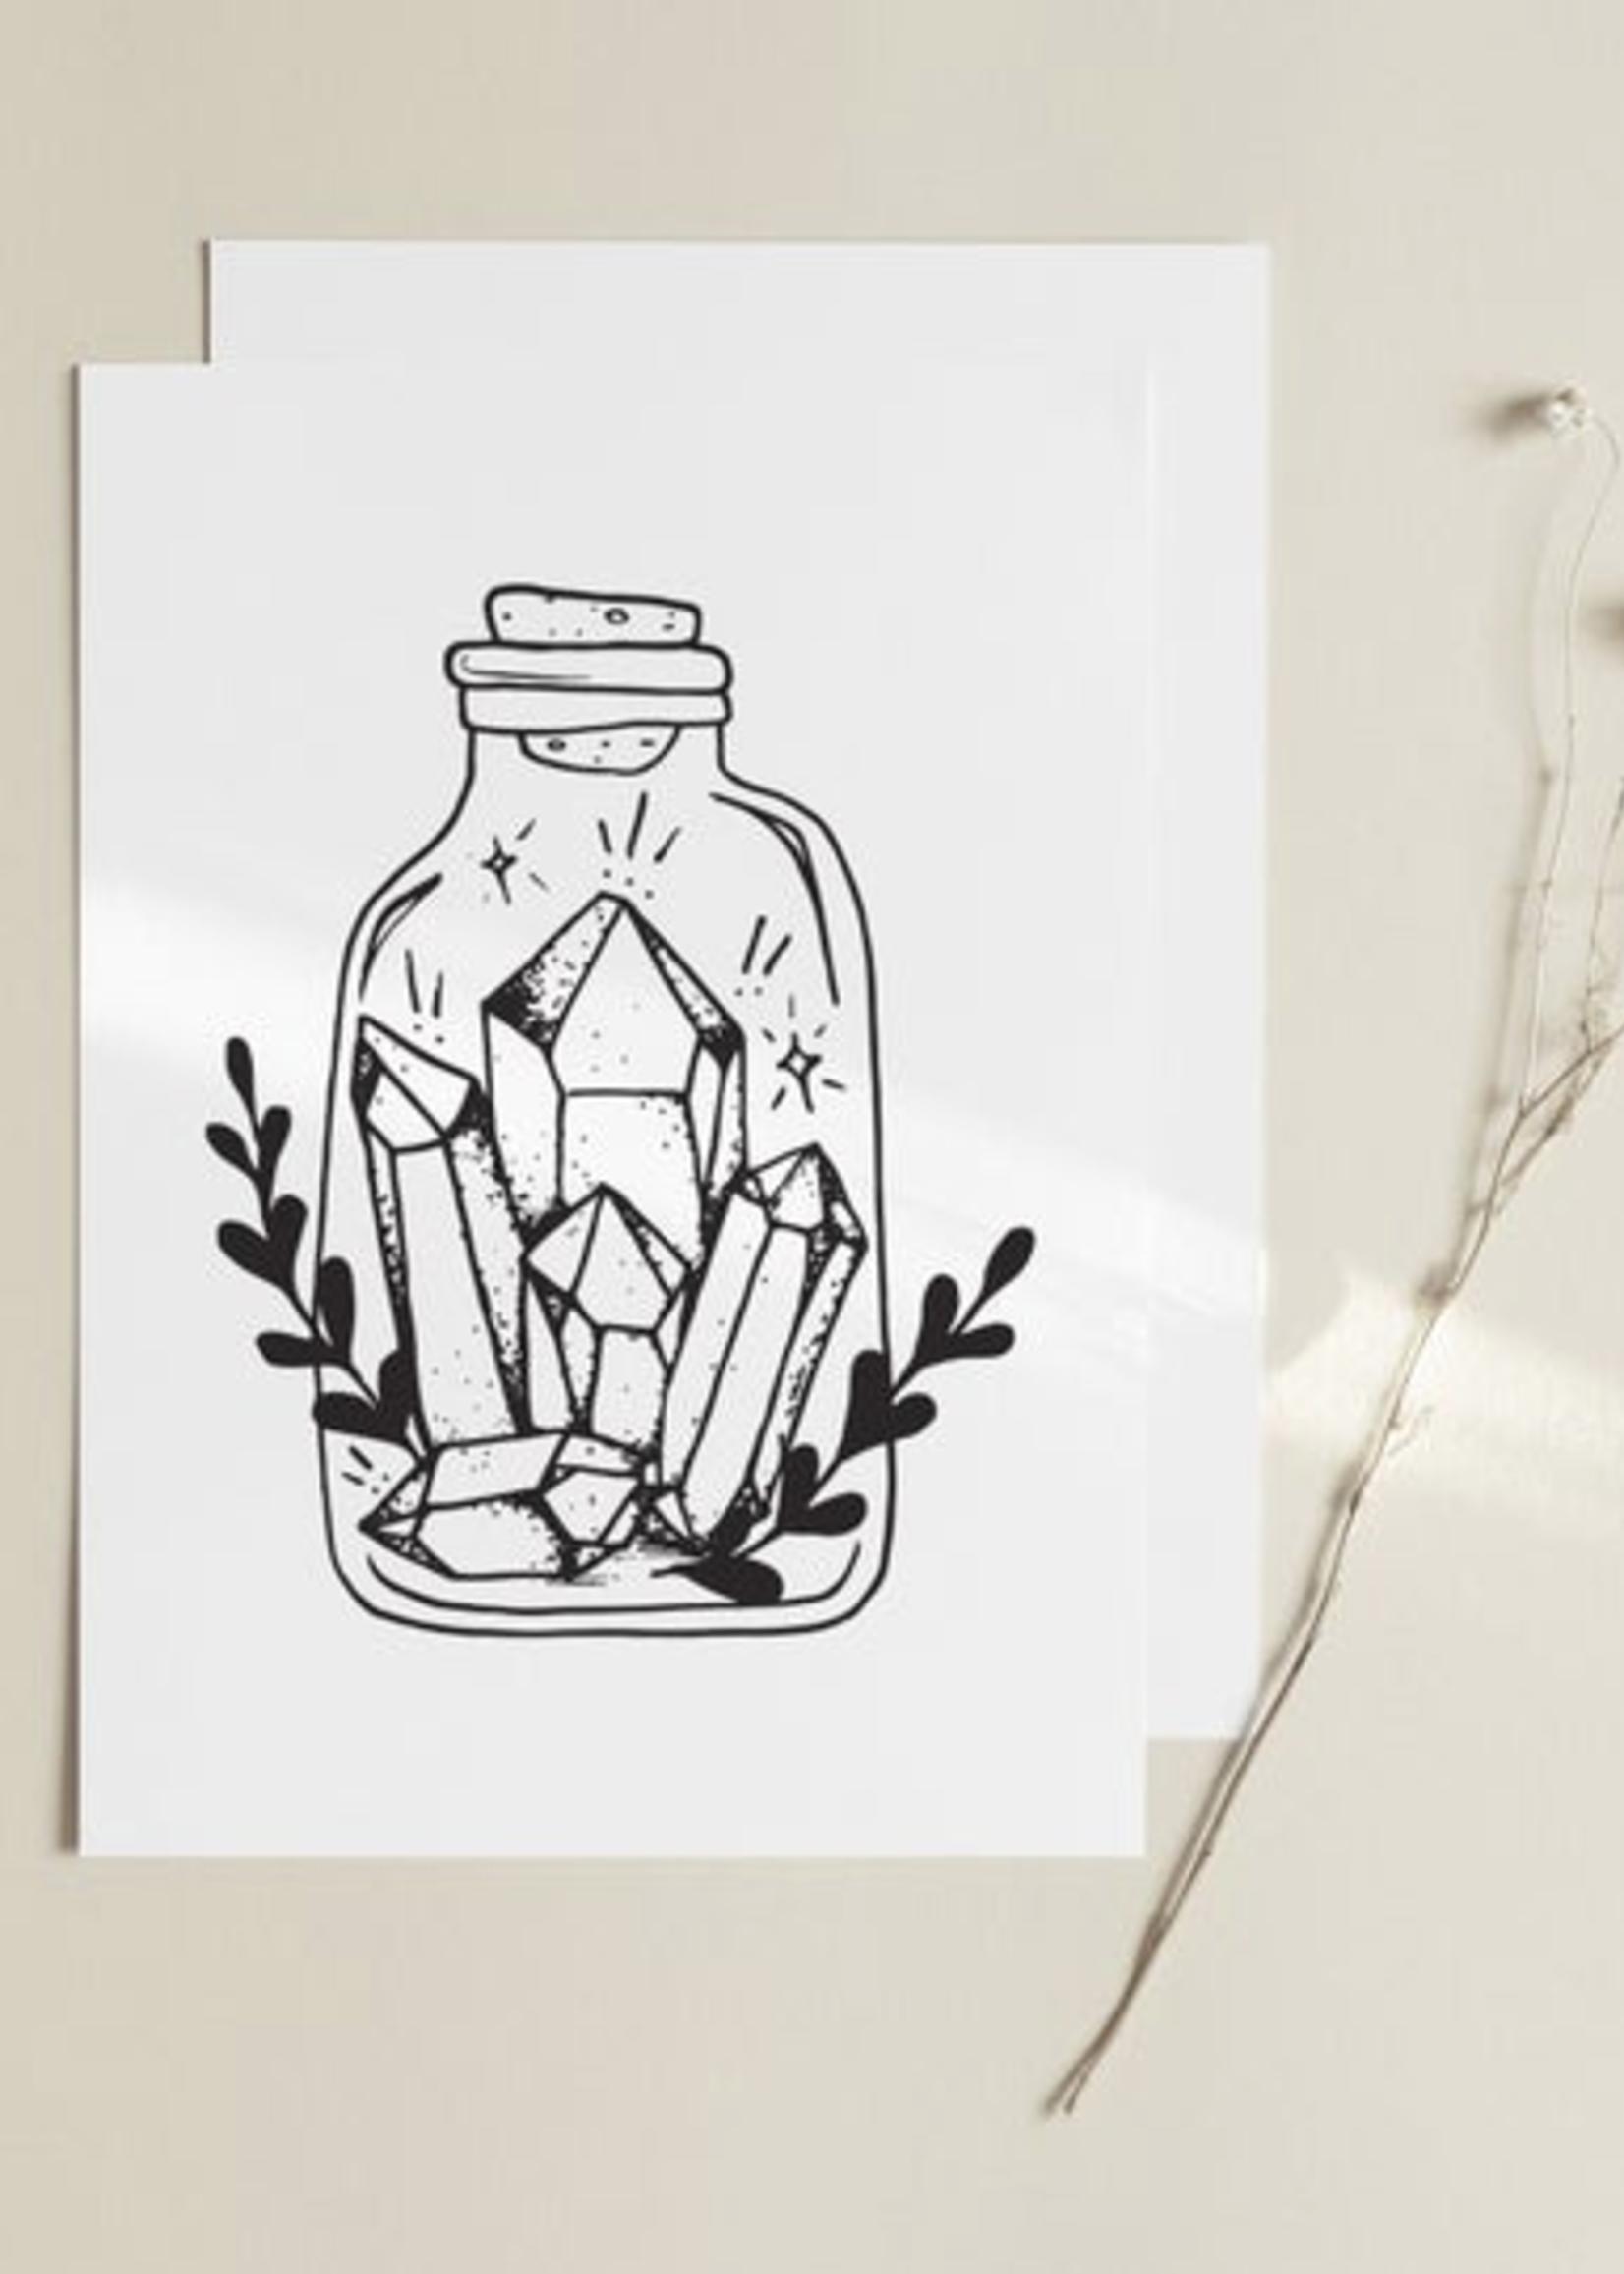 MELINA/KIMBERLEY BC MELINA ART PRINT CRYSTAL JAR